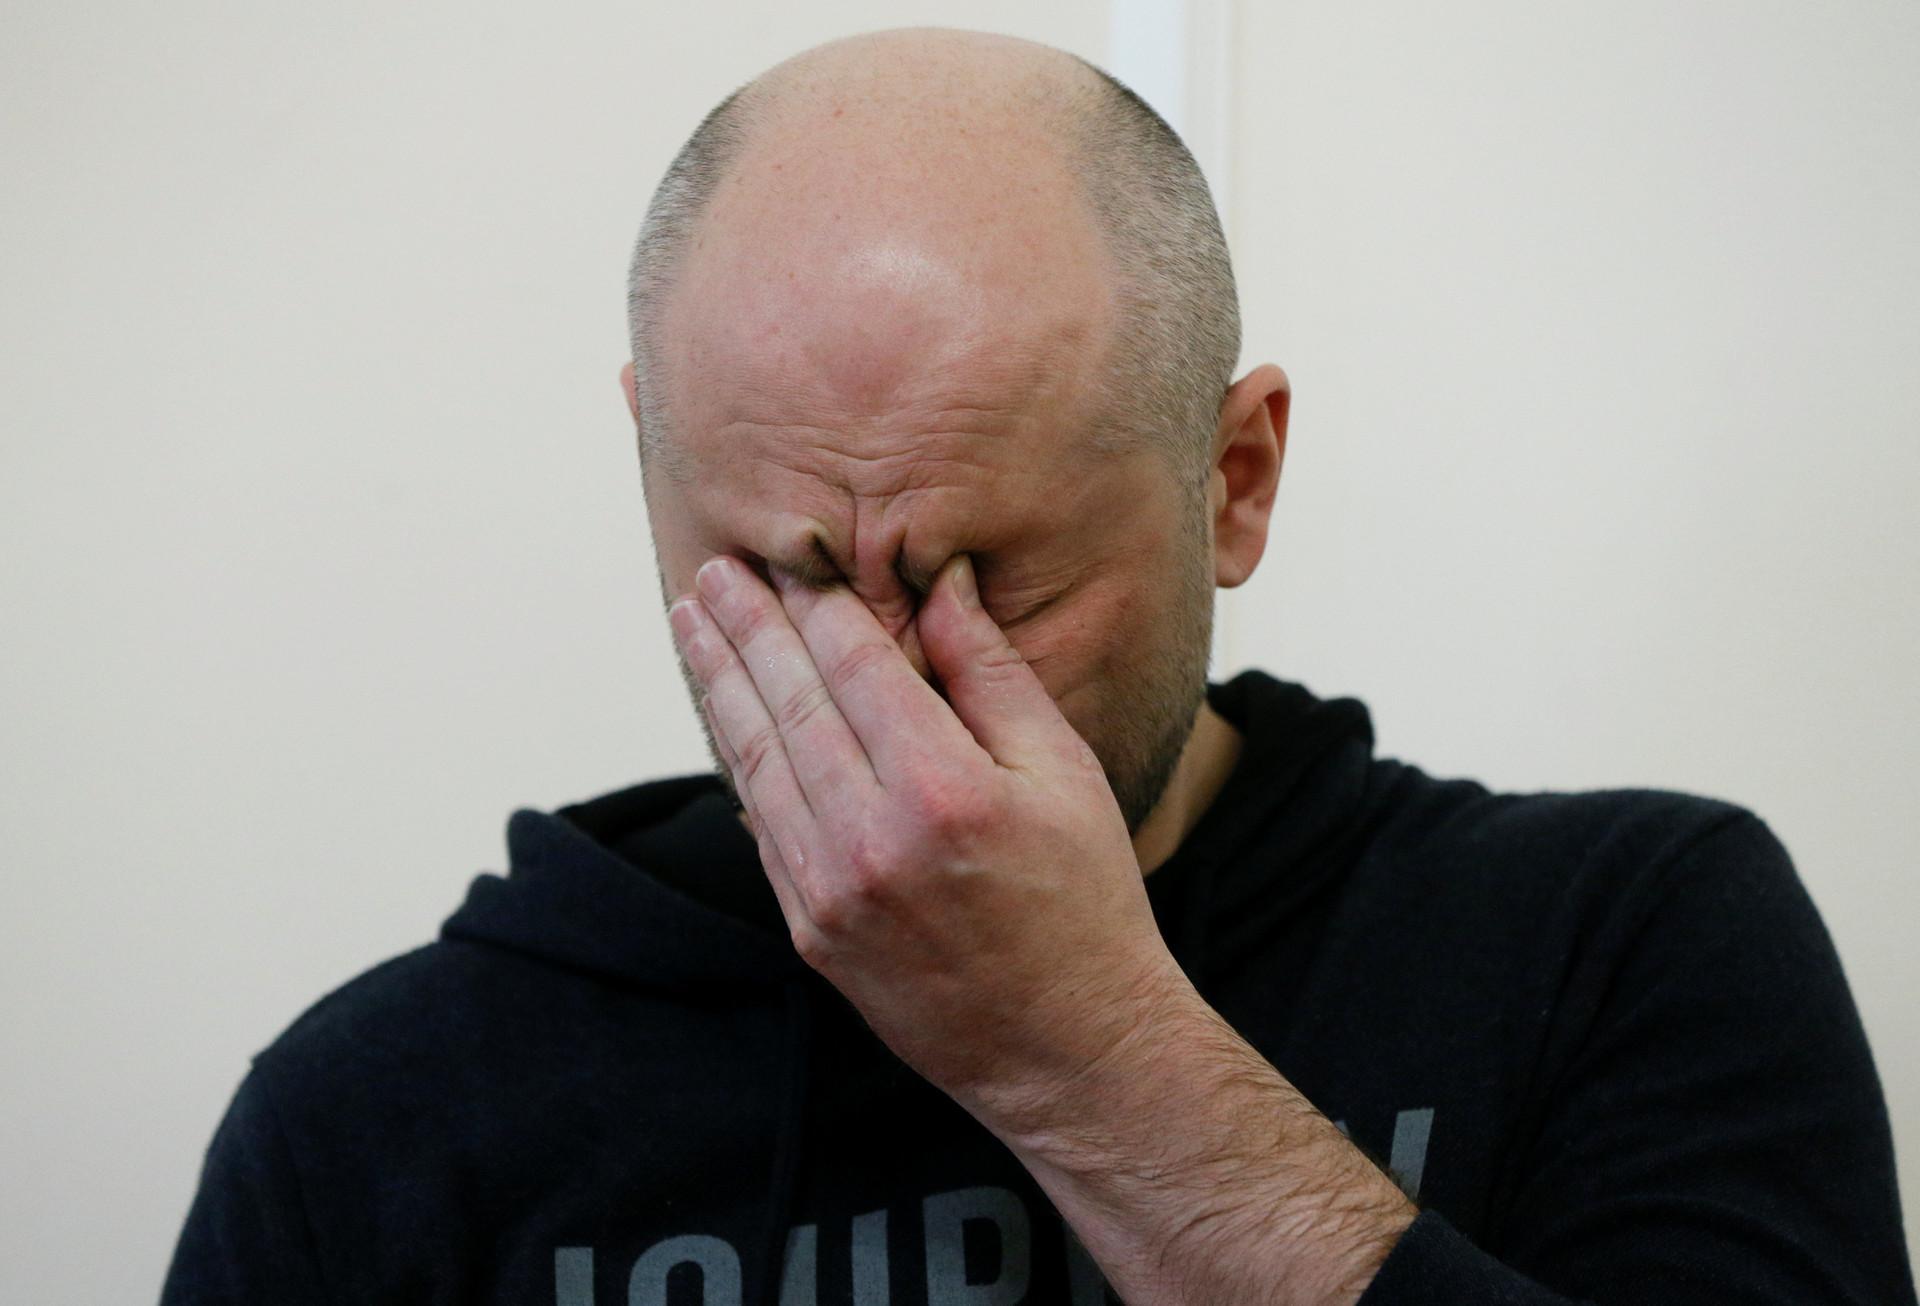 Jurnalis Rusia Arkady Babchenko yang pada 29 Mei lalu dikabarkan tewas ditembak di kediamannya di Kiev, Ukraina, ternyata masih hidup. Ia memberikan keterangan pers pada Rabu (30/5).